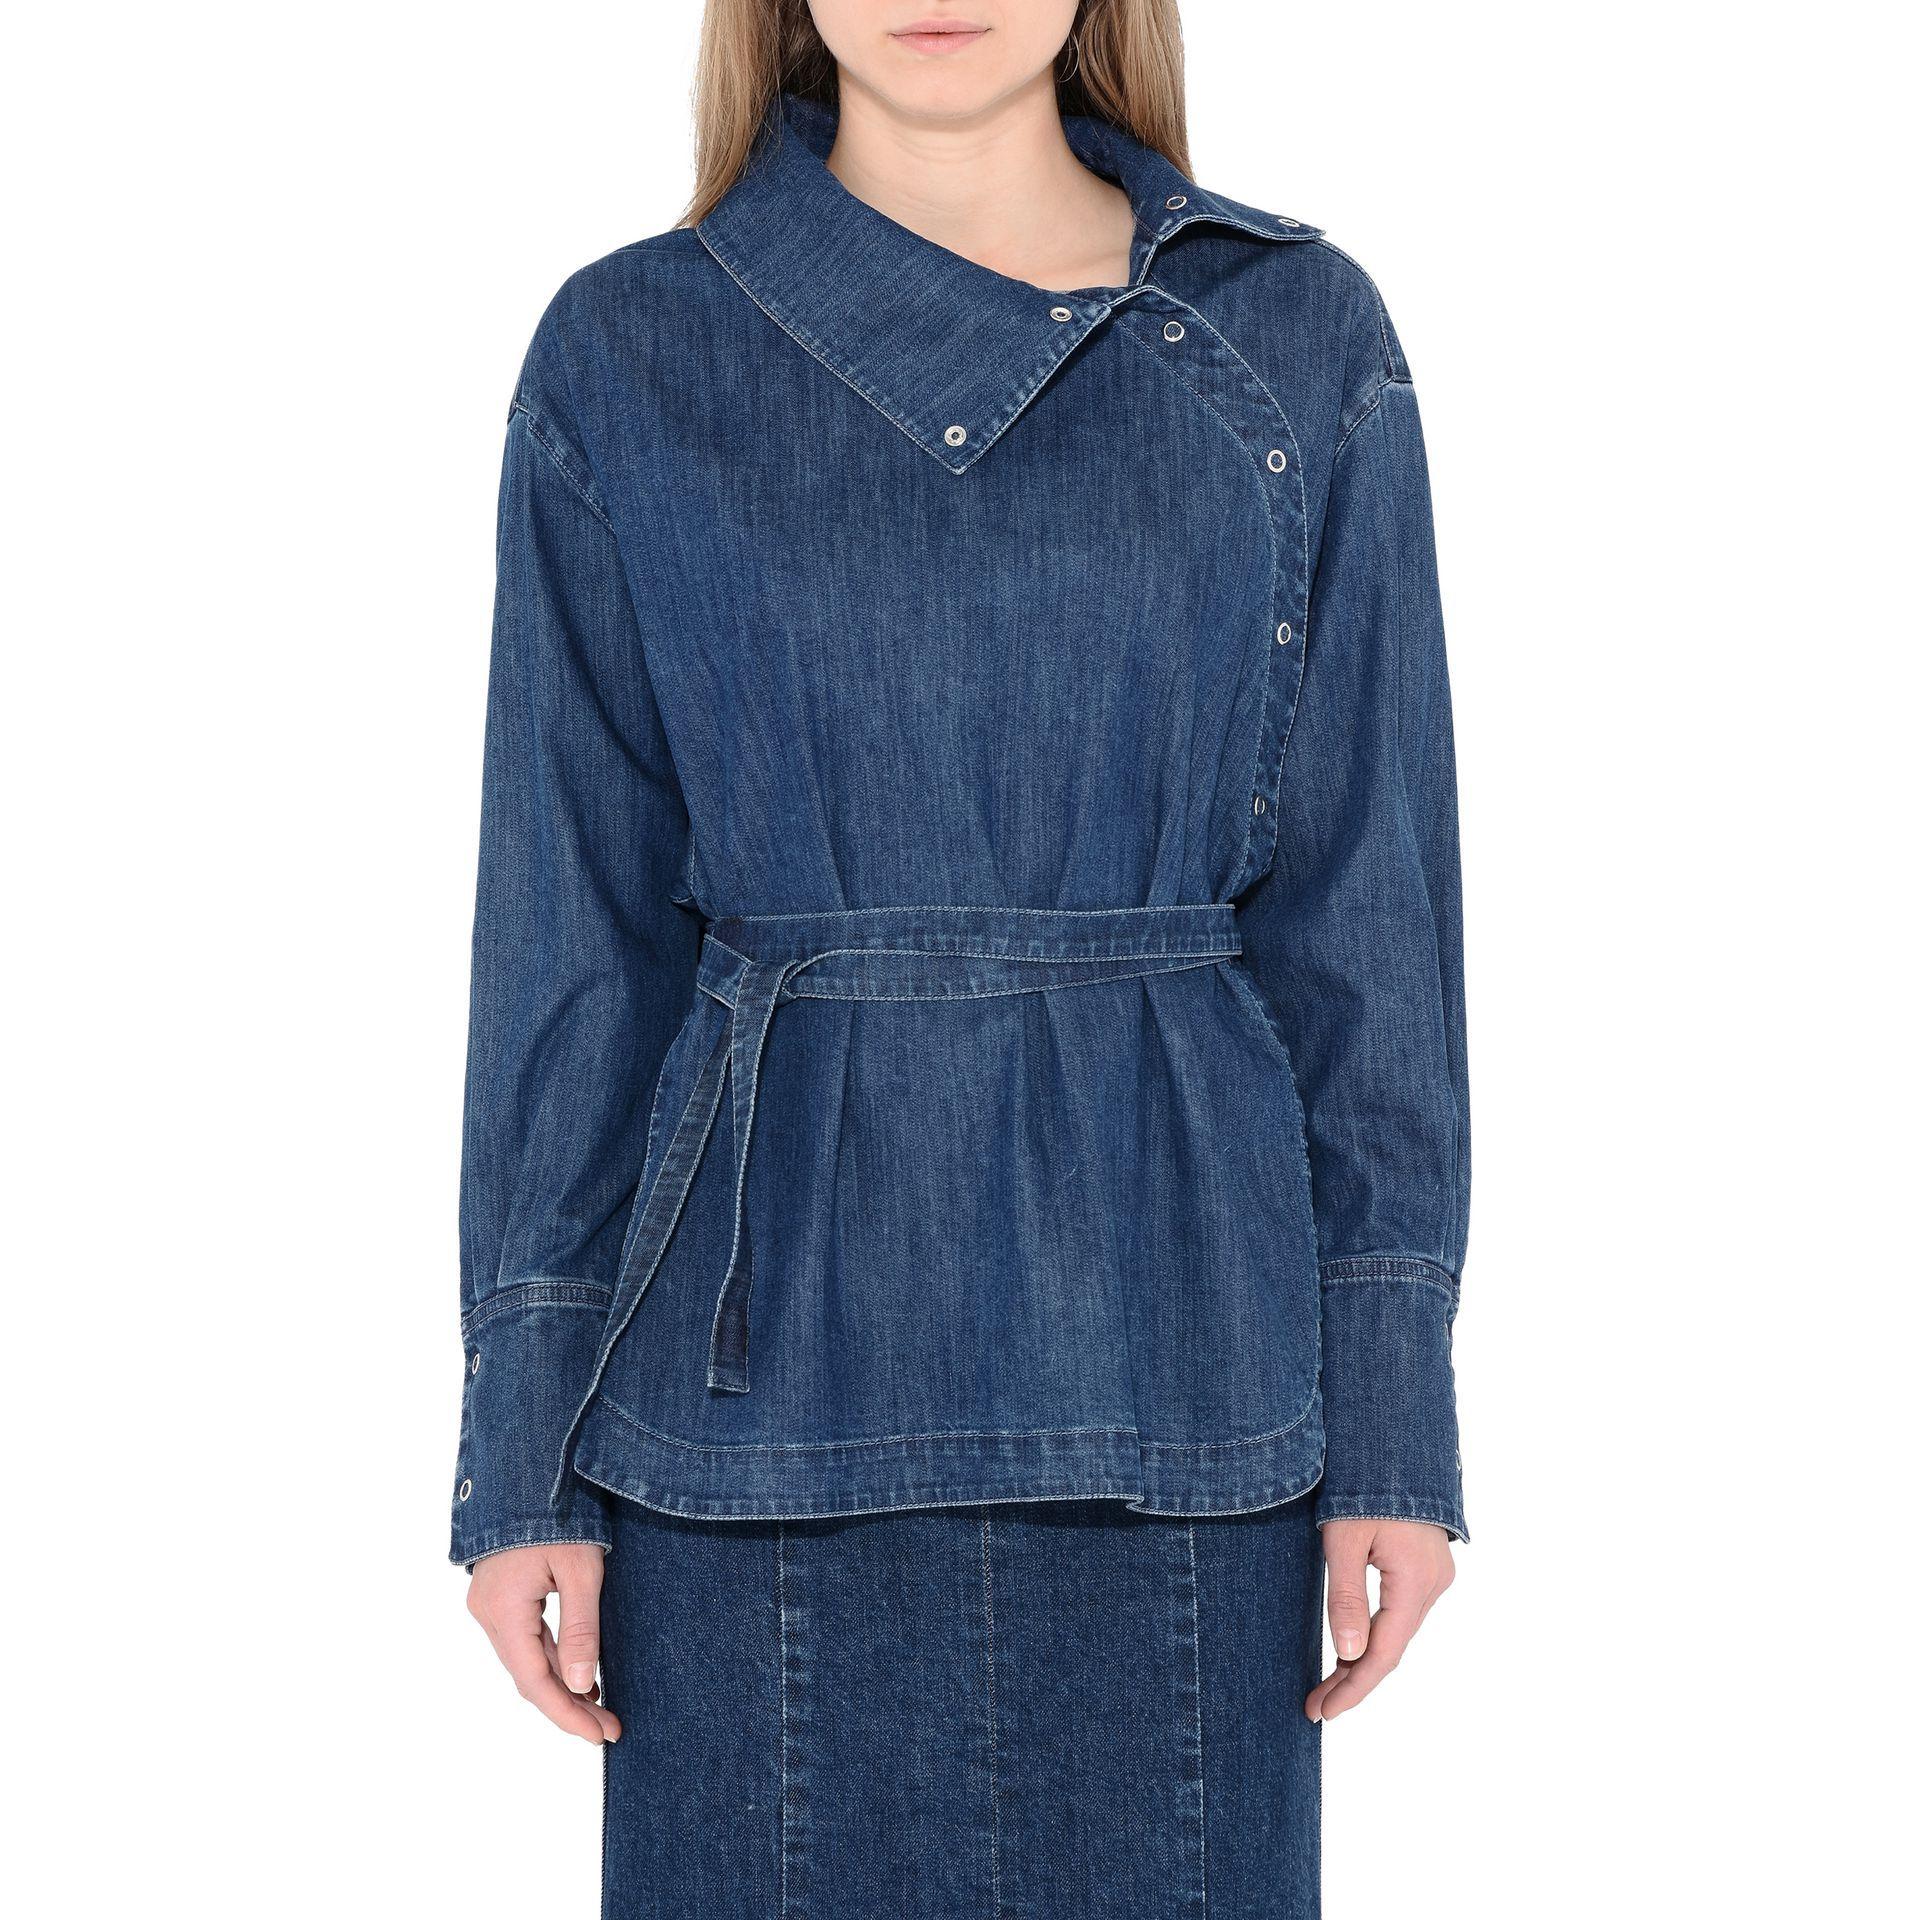 b1549dbc5c Denim Wrap Shirt - STELLA MCCARTNEY